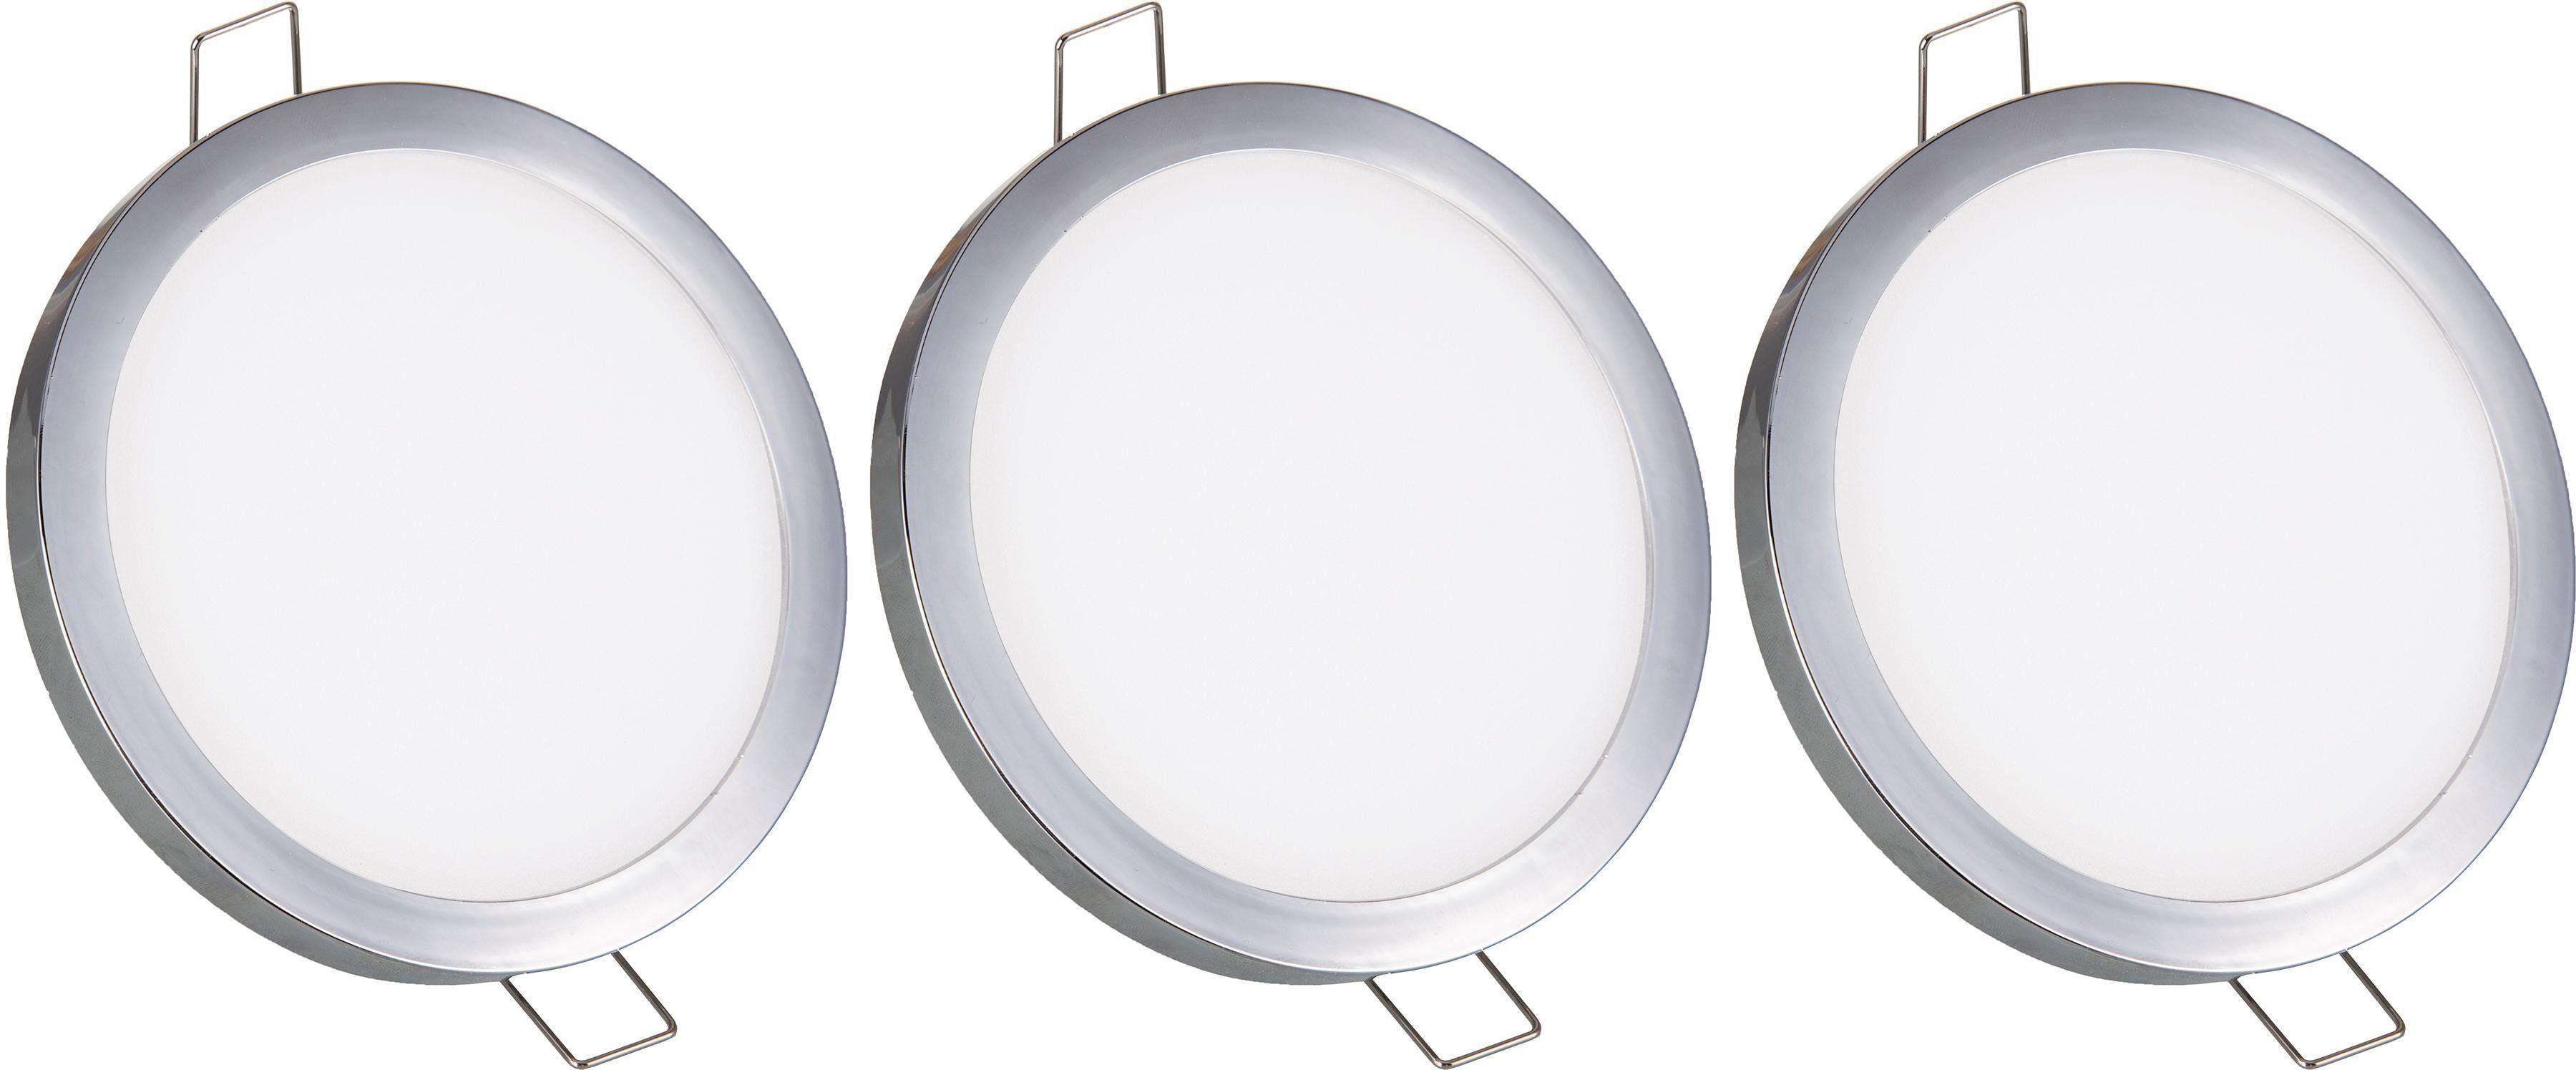 Nino Leuchten LED Einbaustrahler Sparky, LED-Board, 1 St., Warmweiß